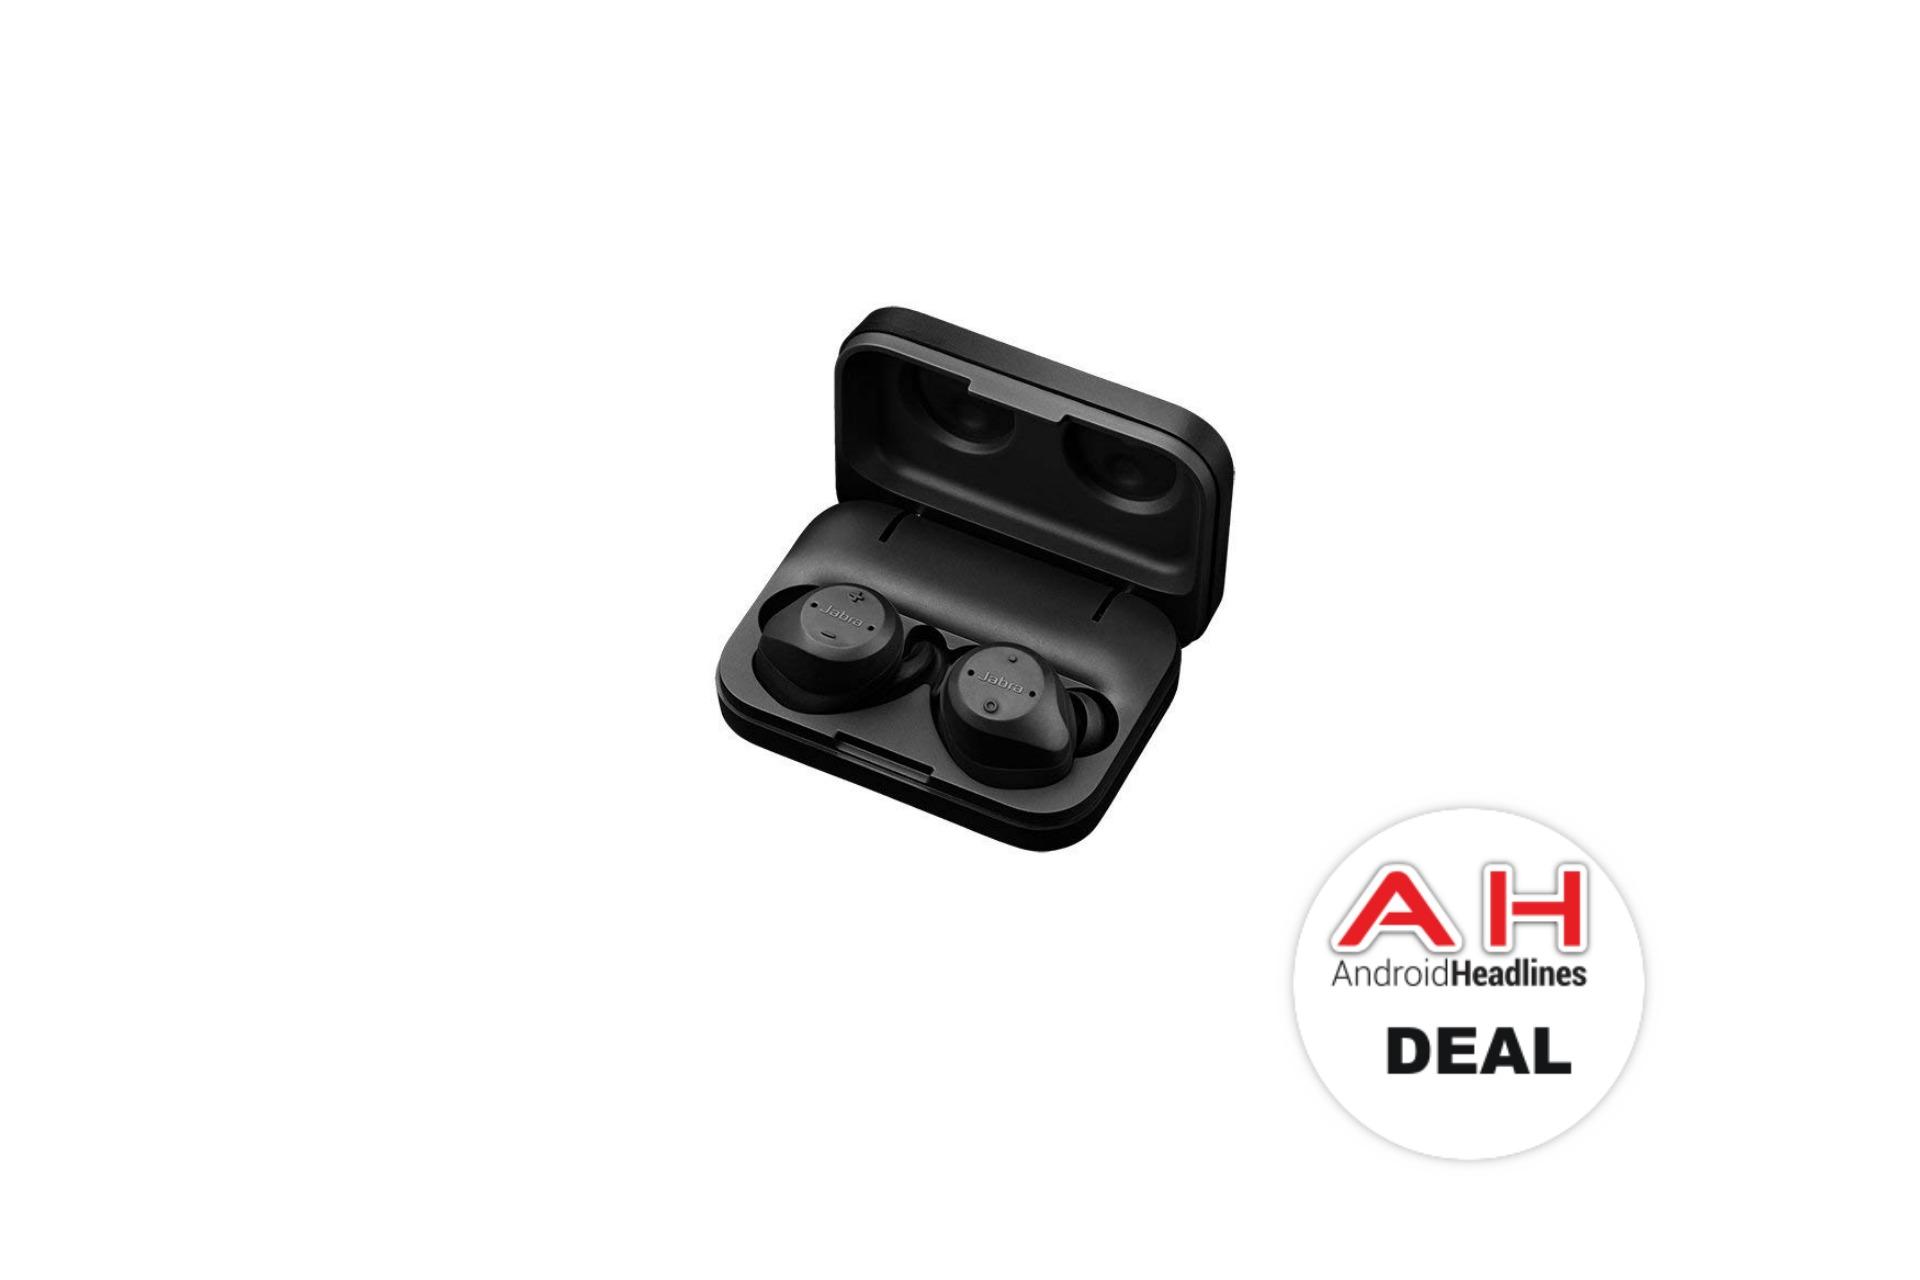 Deal: Jabra Elite Sport Wireless Earbuds For $139 – August 2018